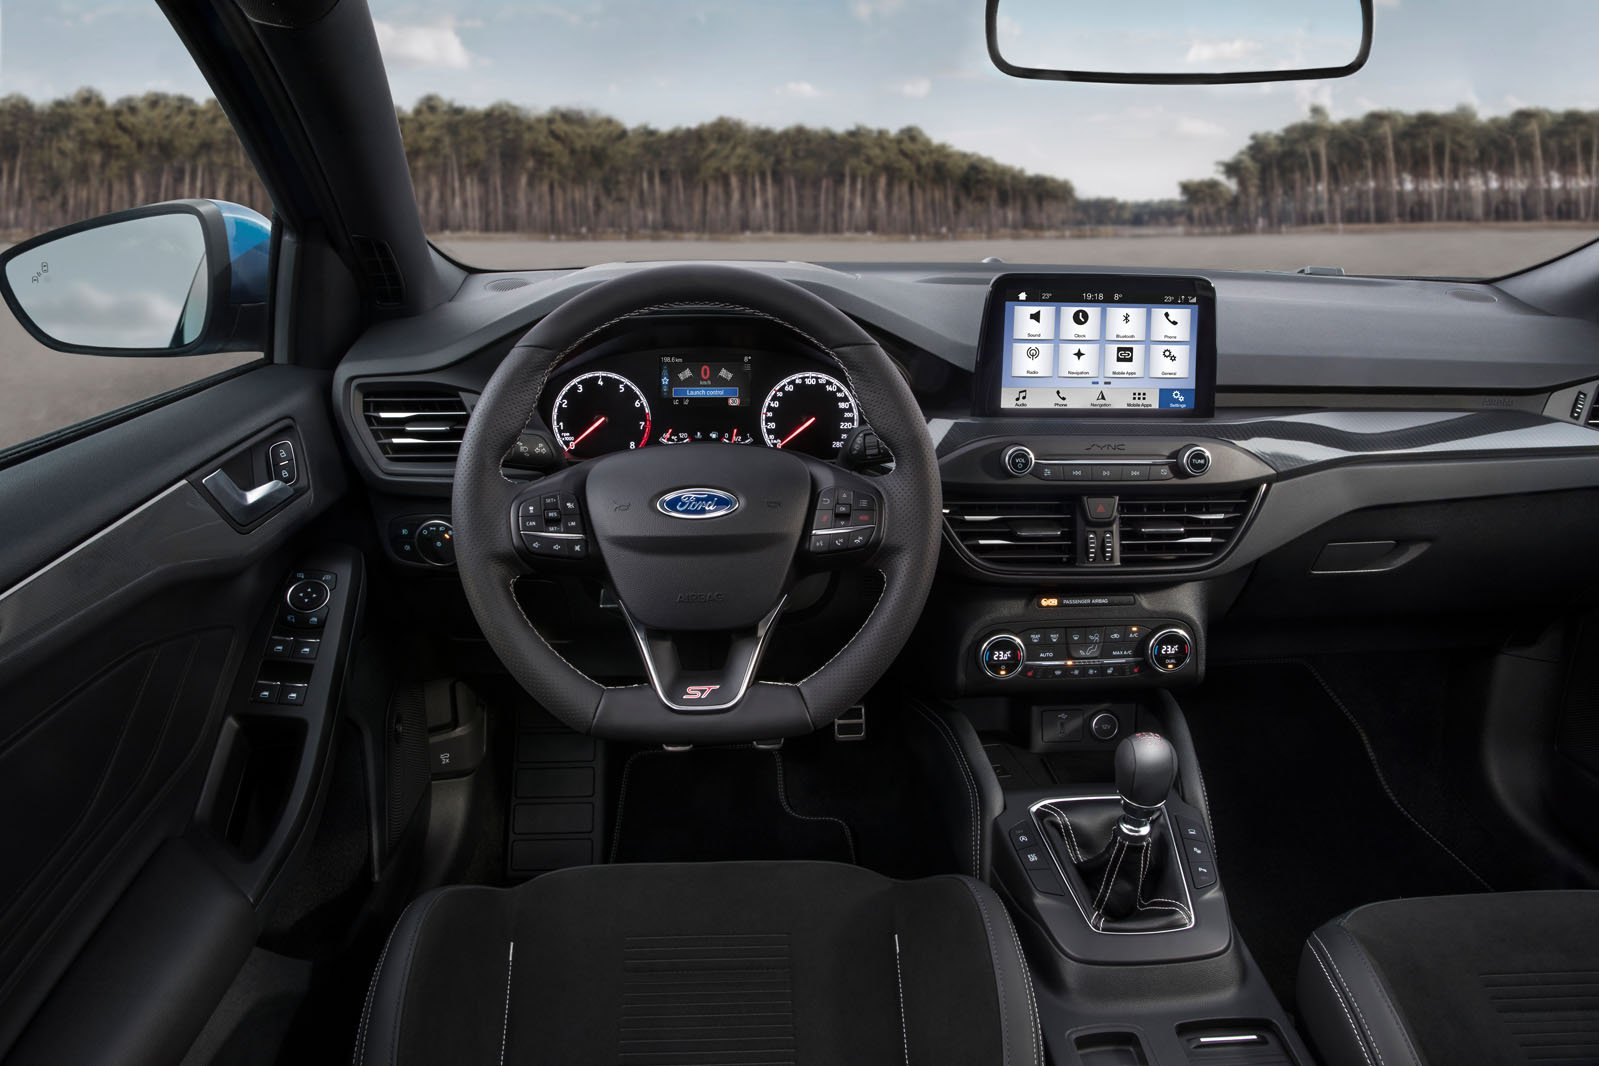 Ford Focus St Interior Sat Nav Dashboard What Car